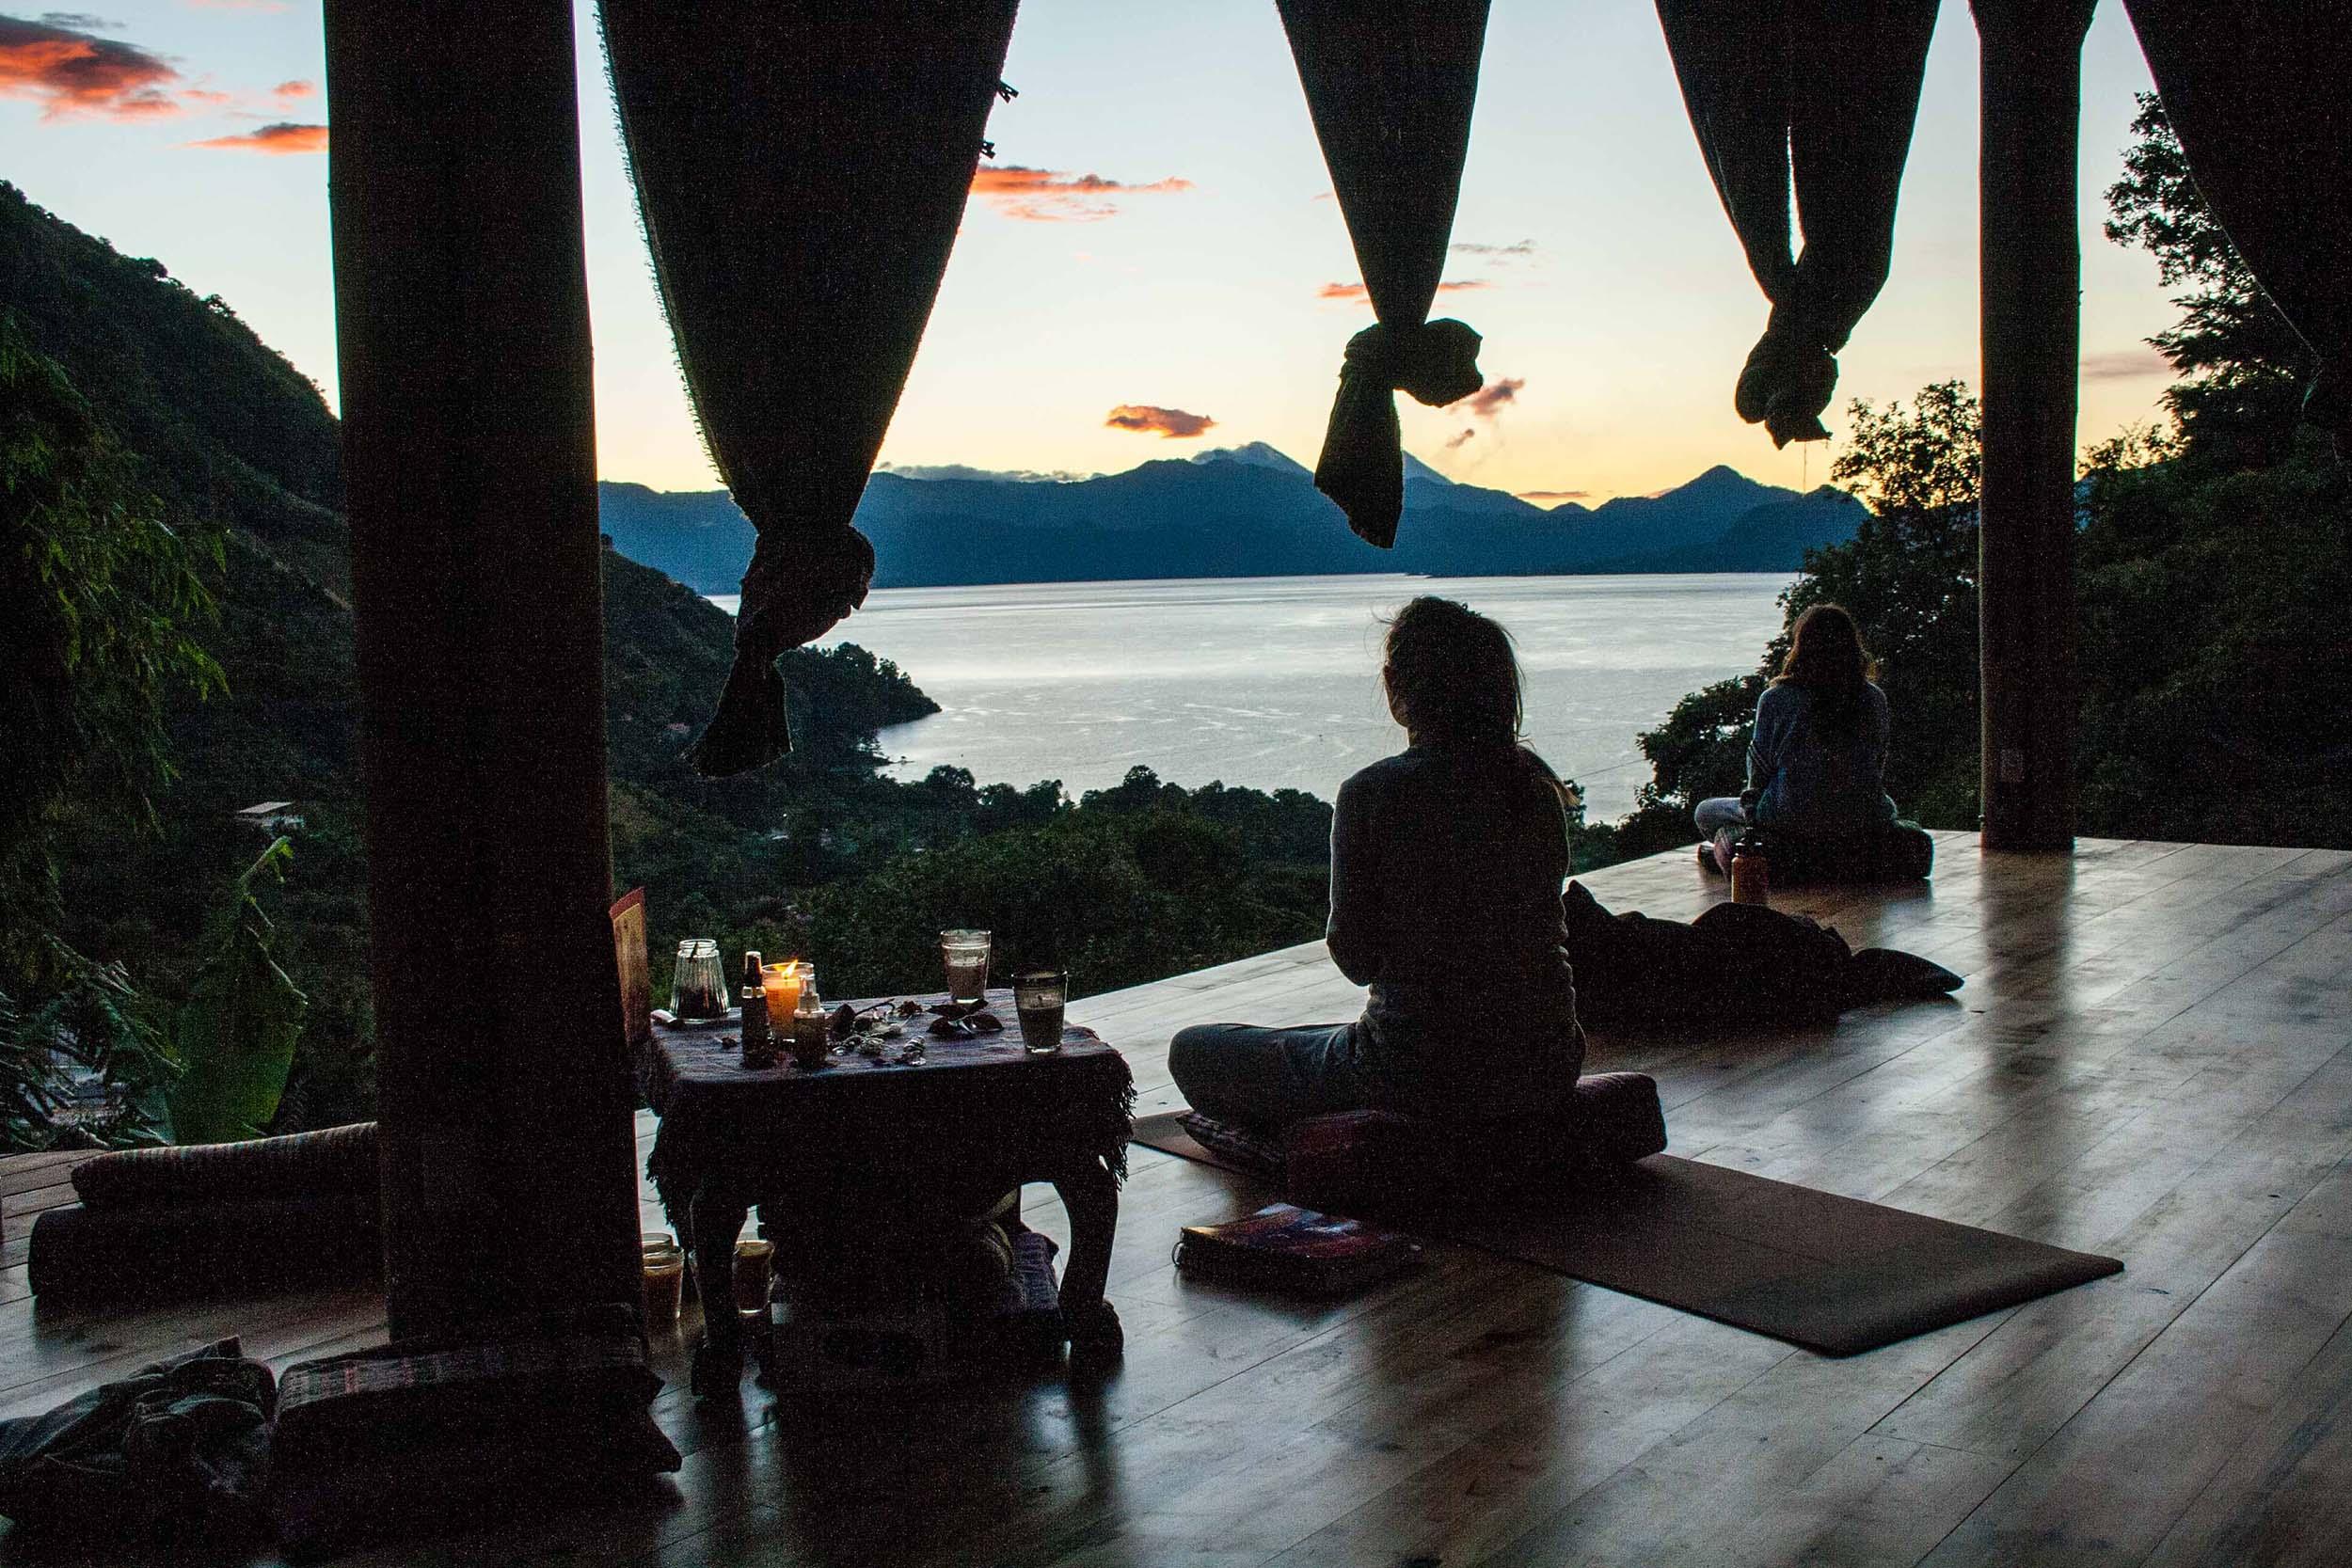 equinox-growth-ritual-yoga-2.jpg